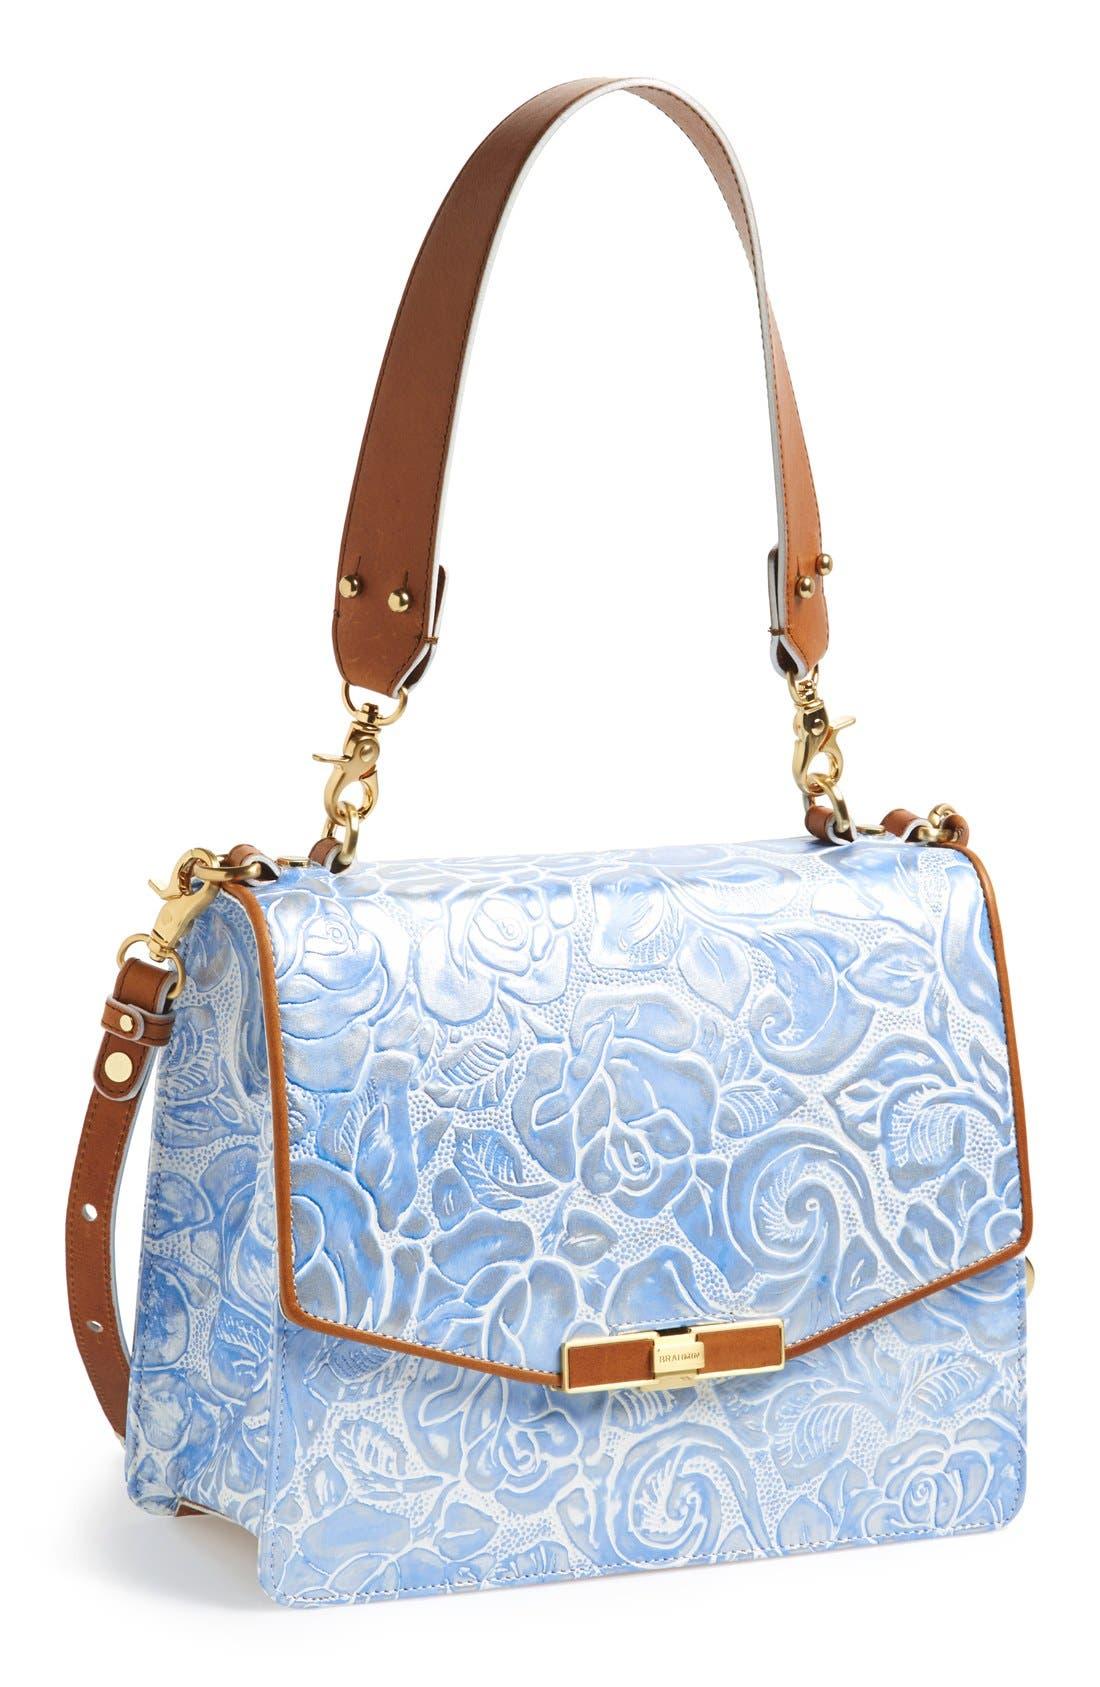 Alternate Image 1 Selected - Brahmin 'Ophelia' Crossbody Bag